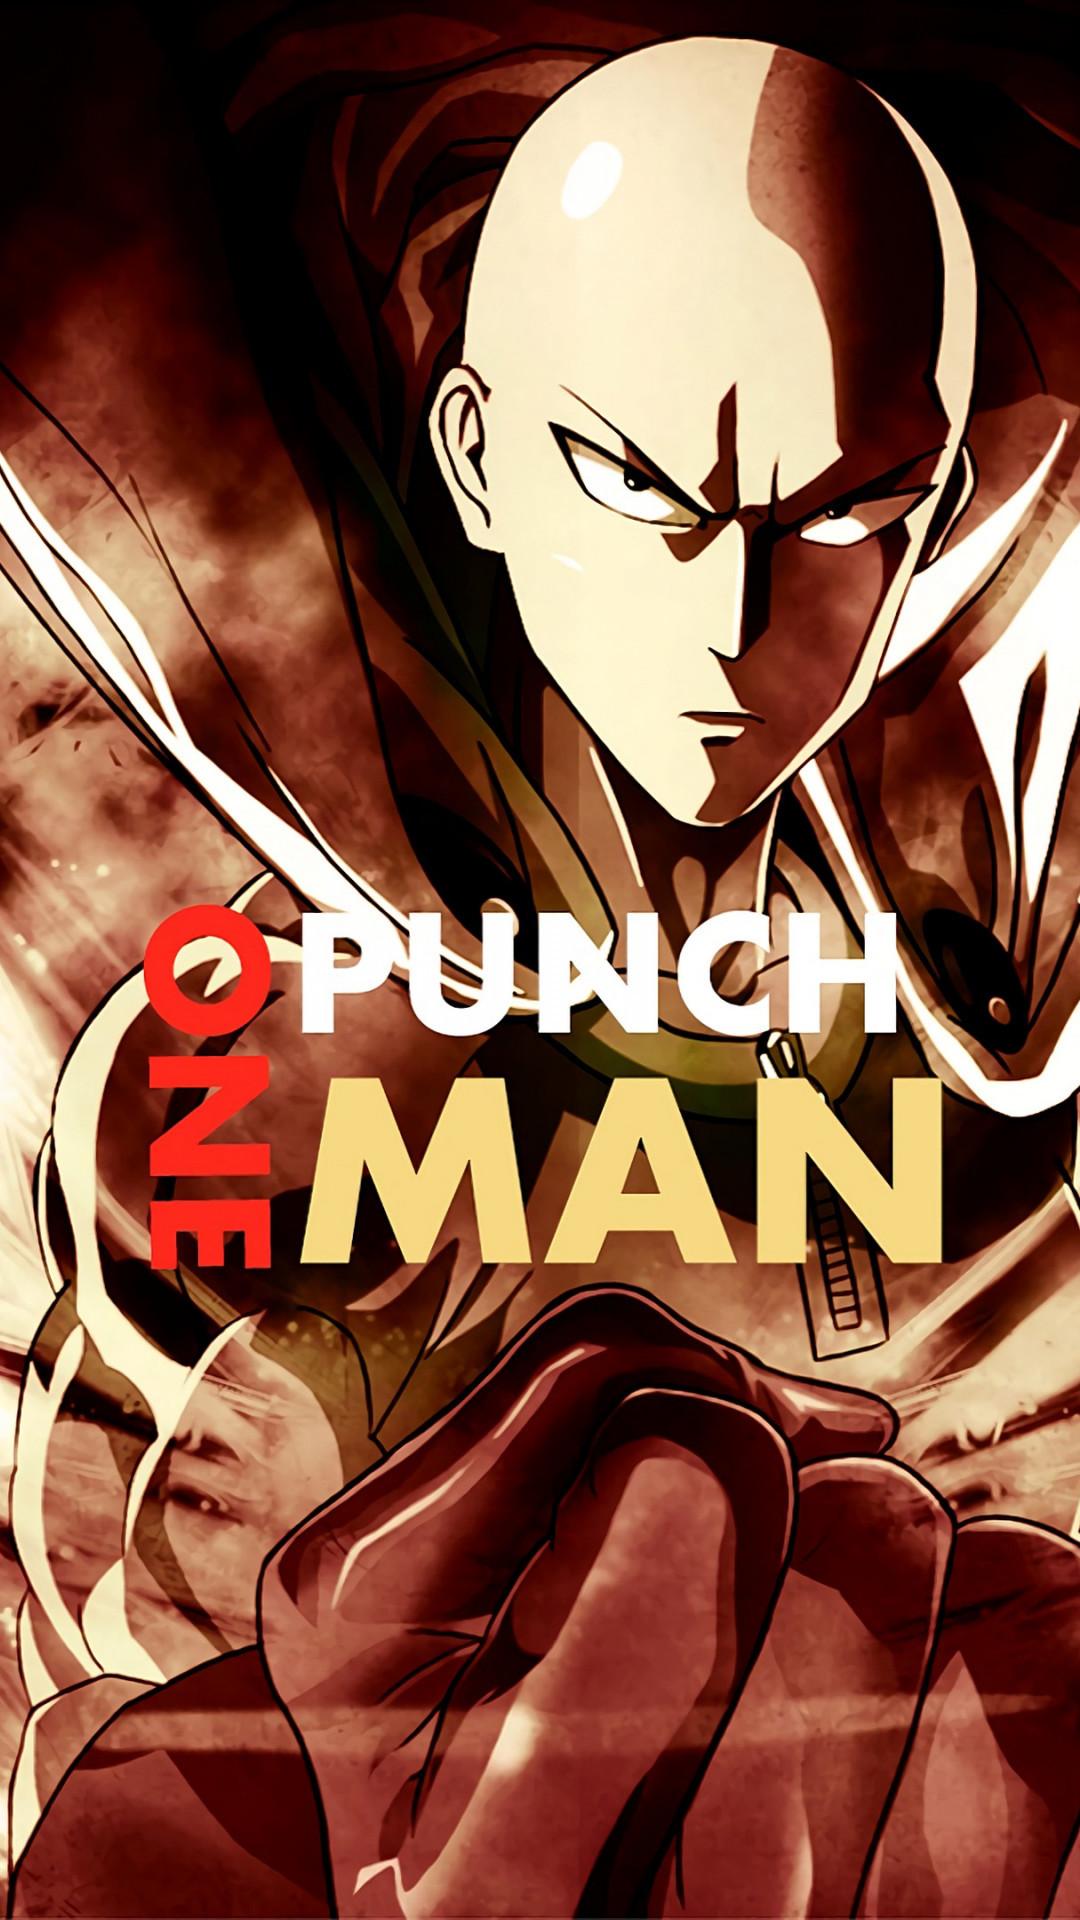 Terbaru 30 Gambar Keren One Punch Man - Gambar Terkeren HD